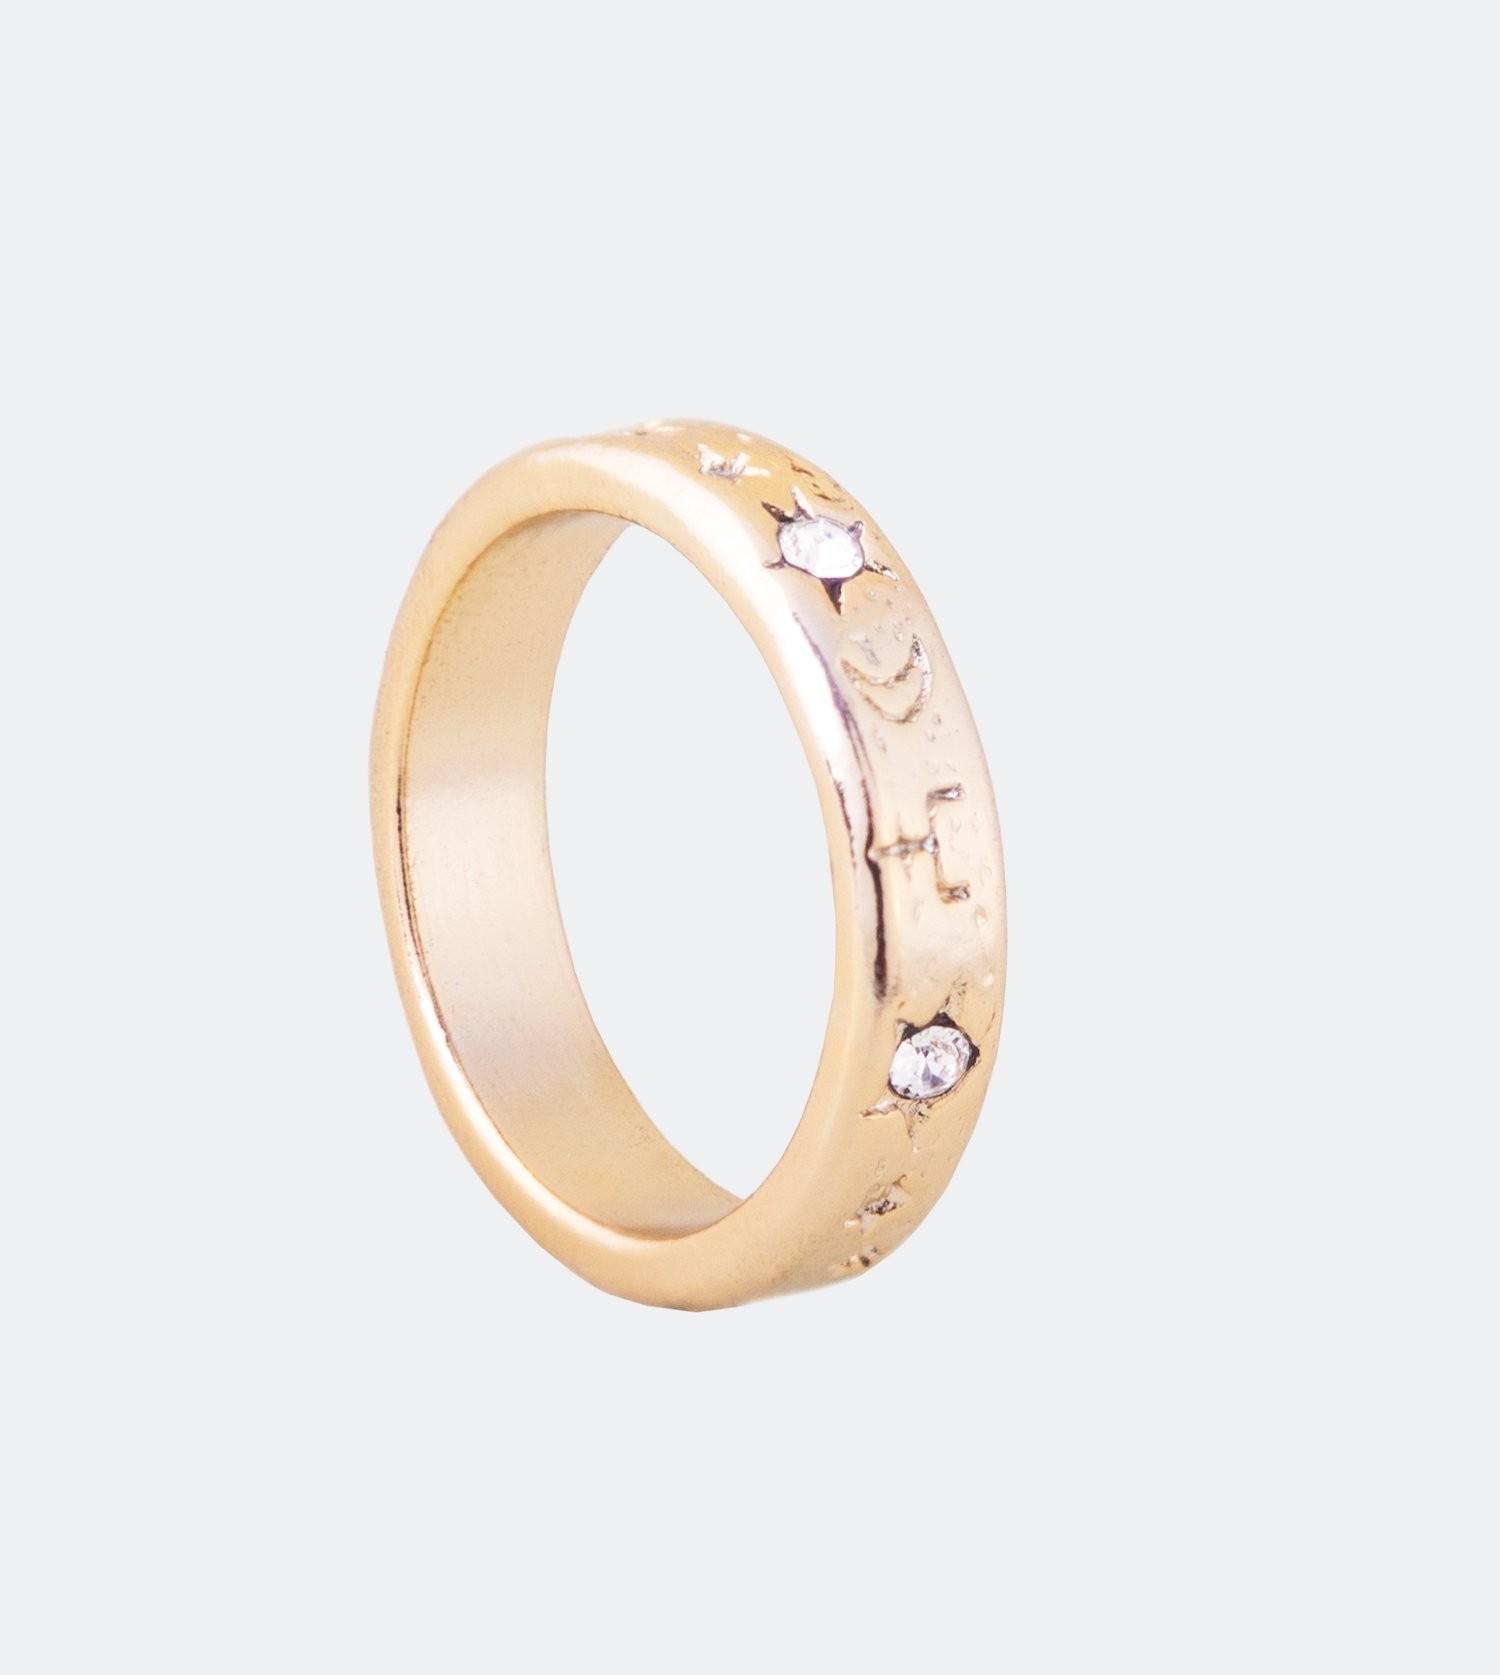 Anekke Jewelery 31702-26-108G